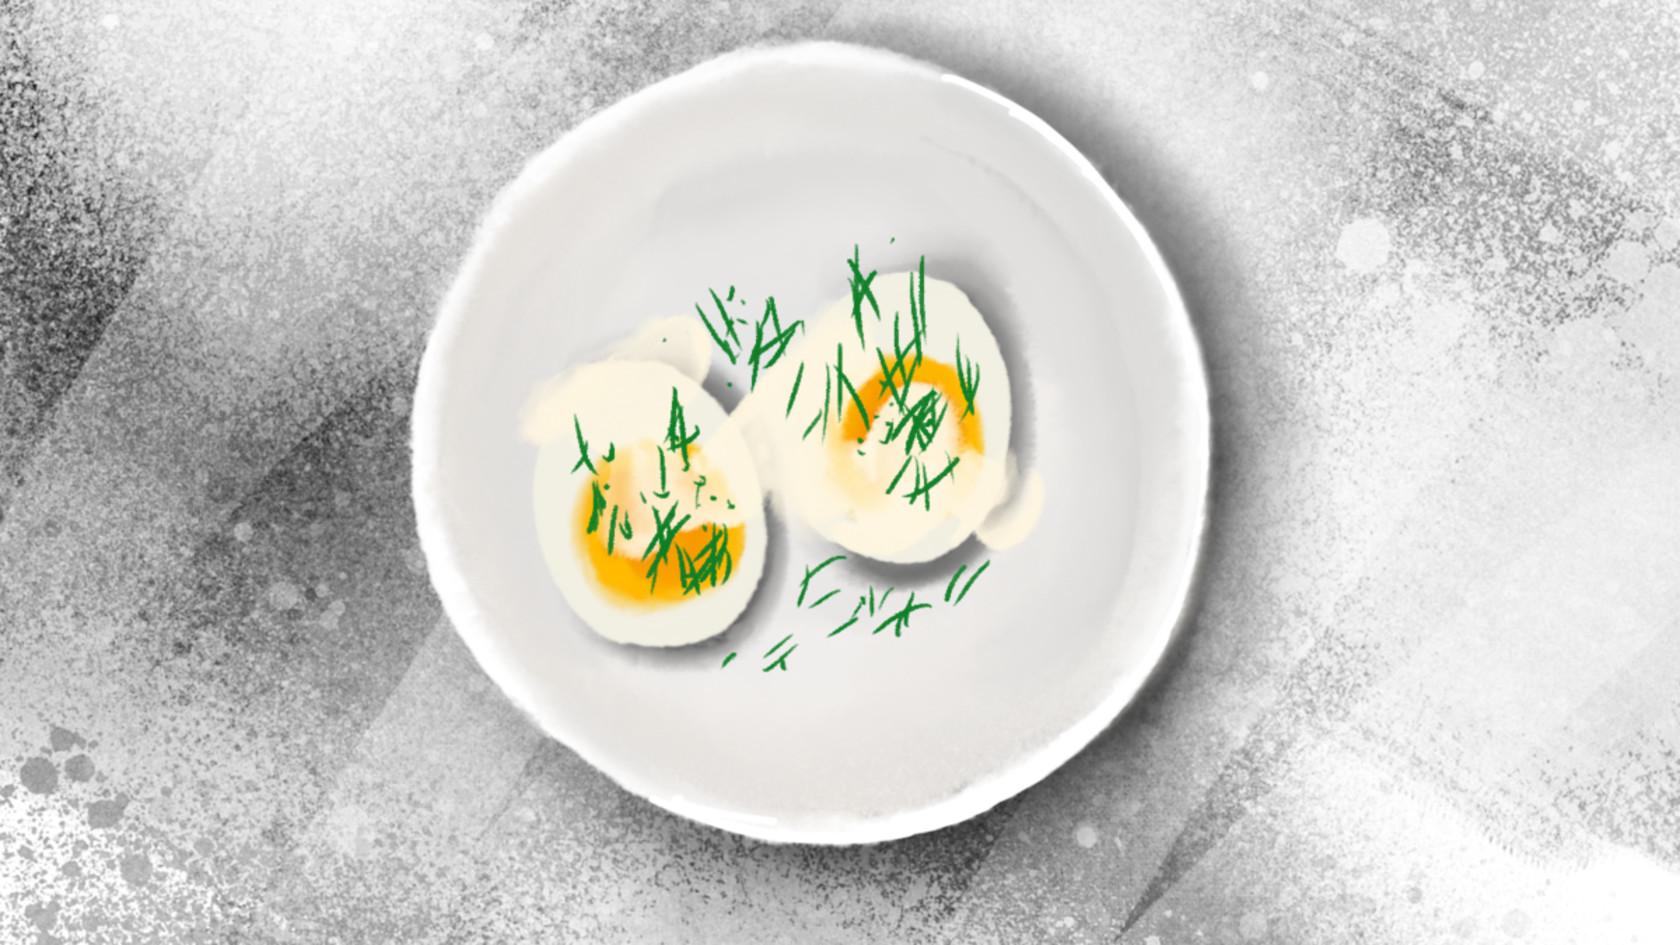 Eggs in mustard bechemel1200x675